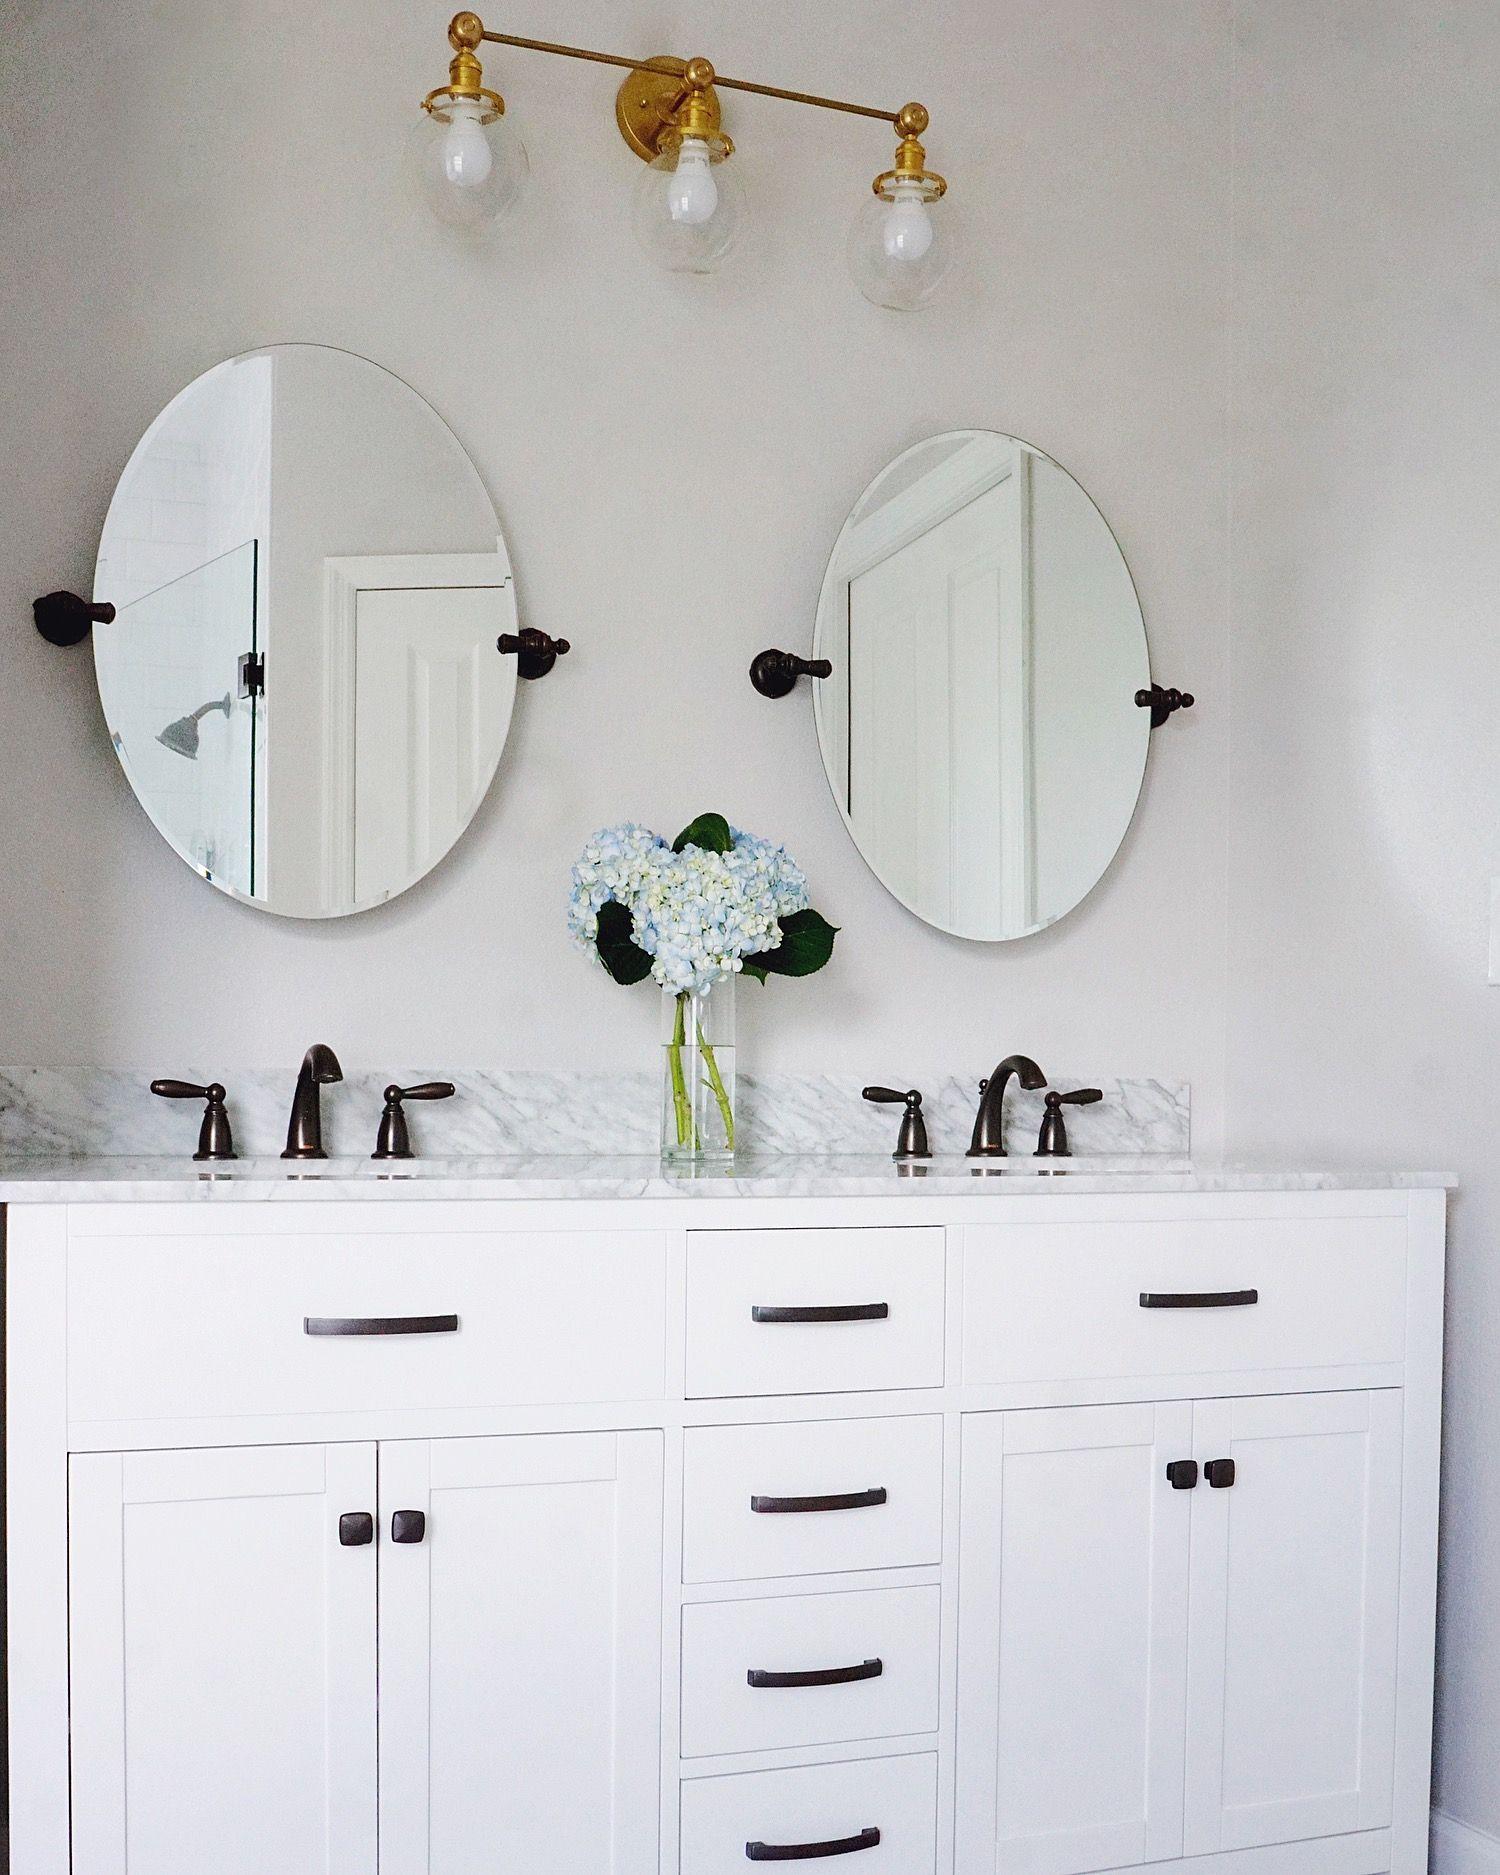 Oval mirror, brass vanity light, white marble vanity, oil